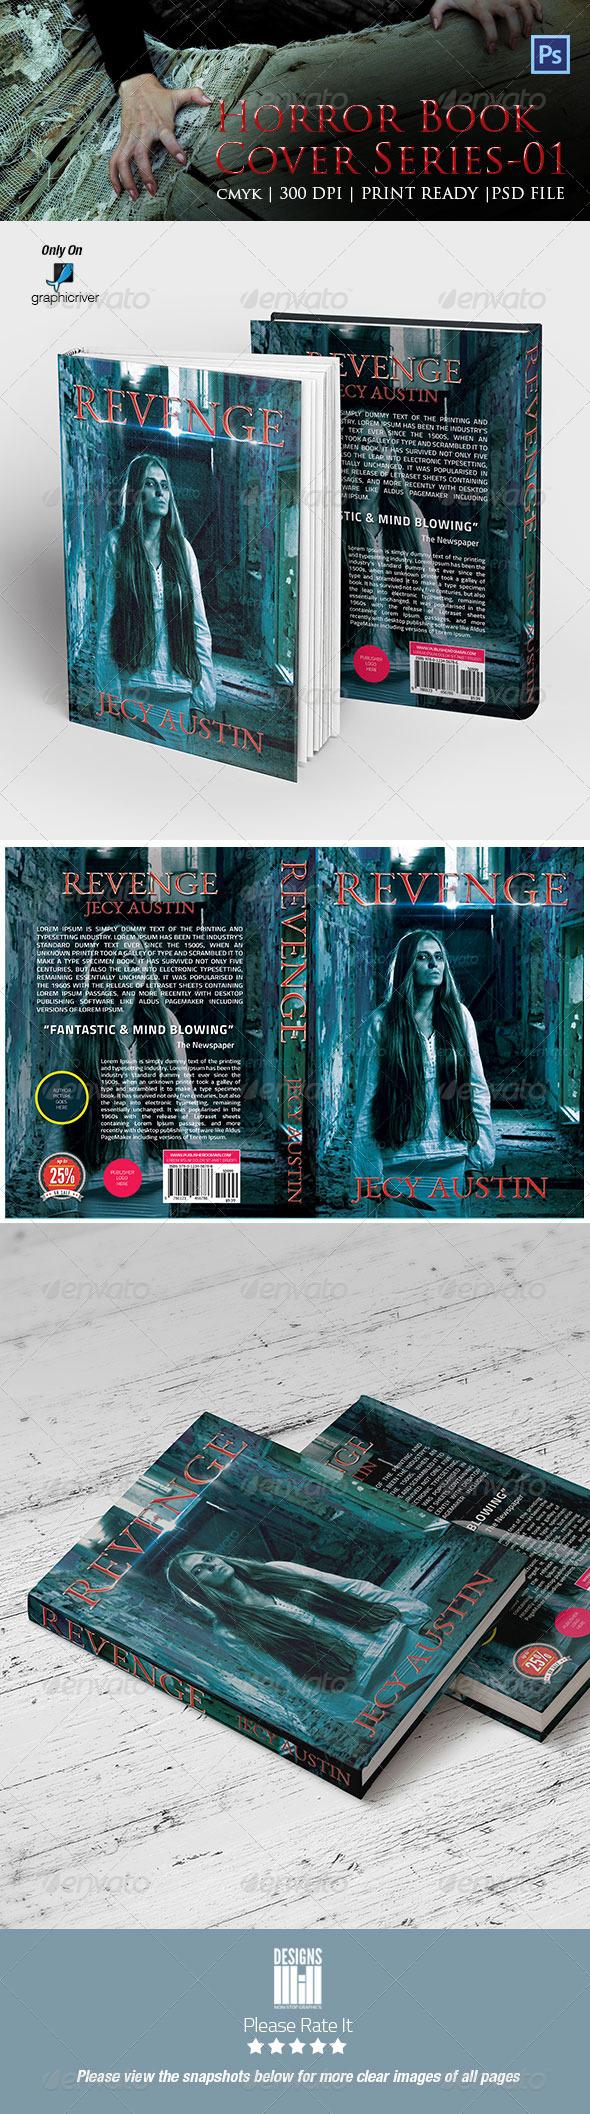 Horror Book Cover 01 - Miscellaneous Print Templates